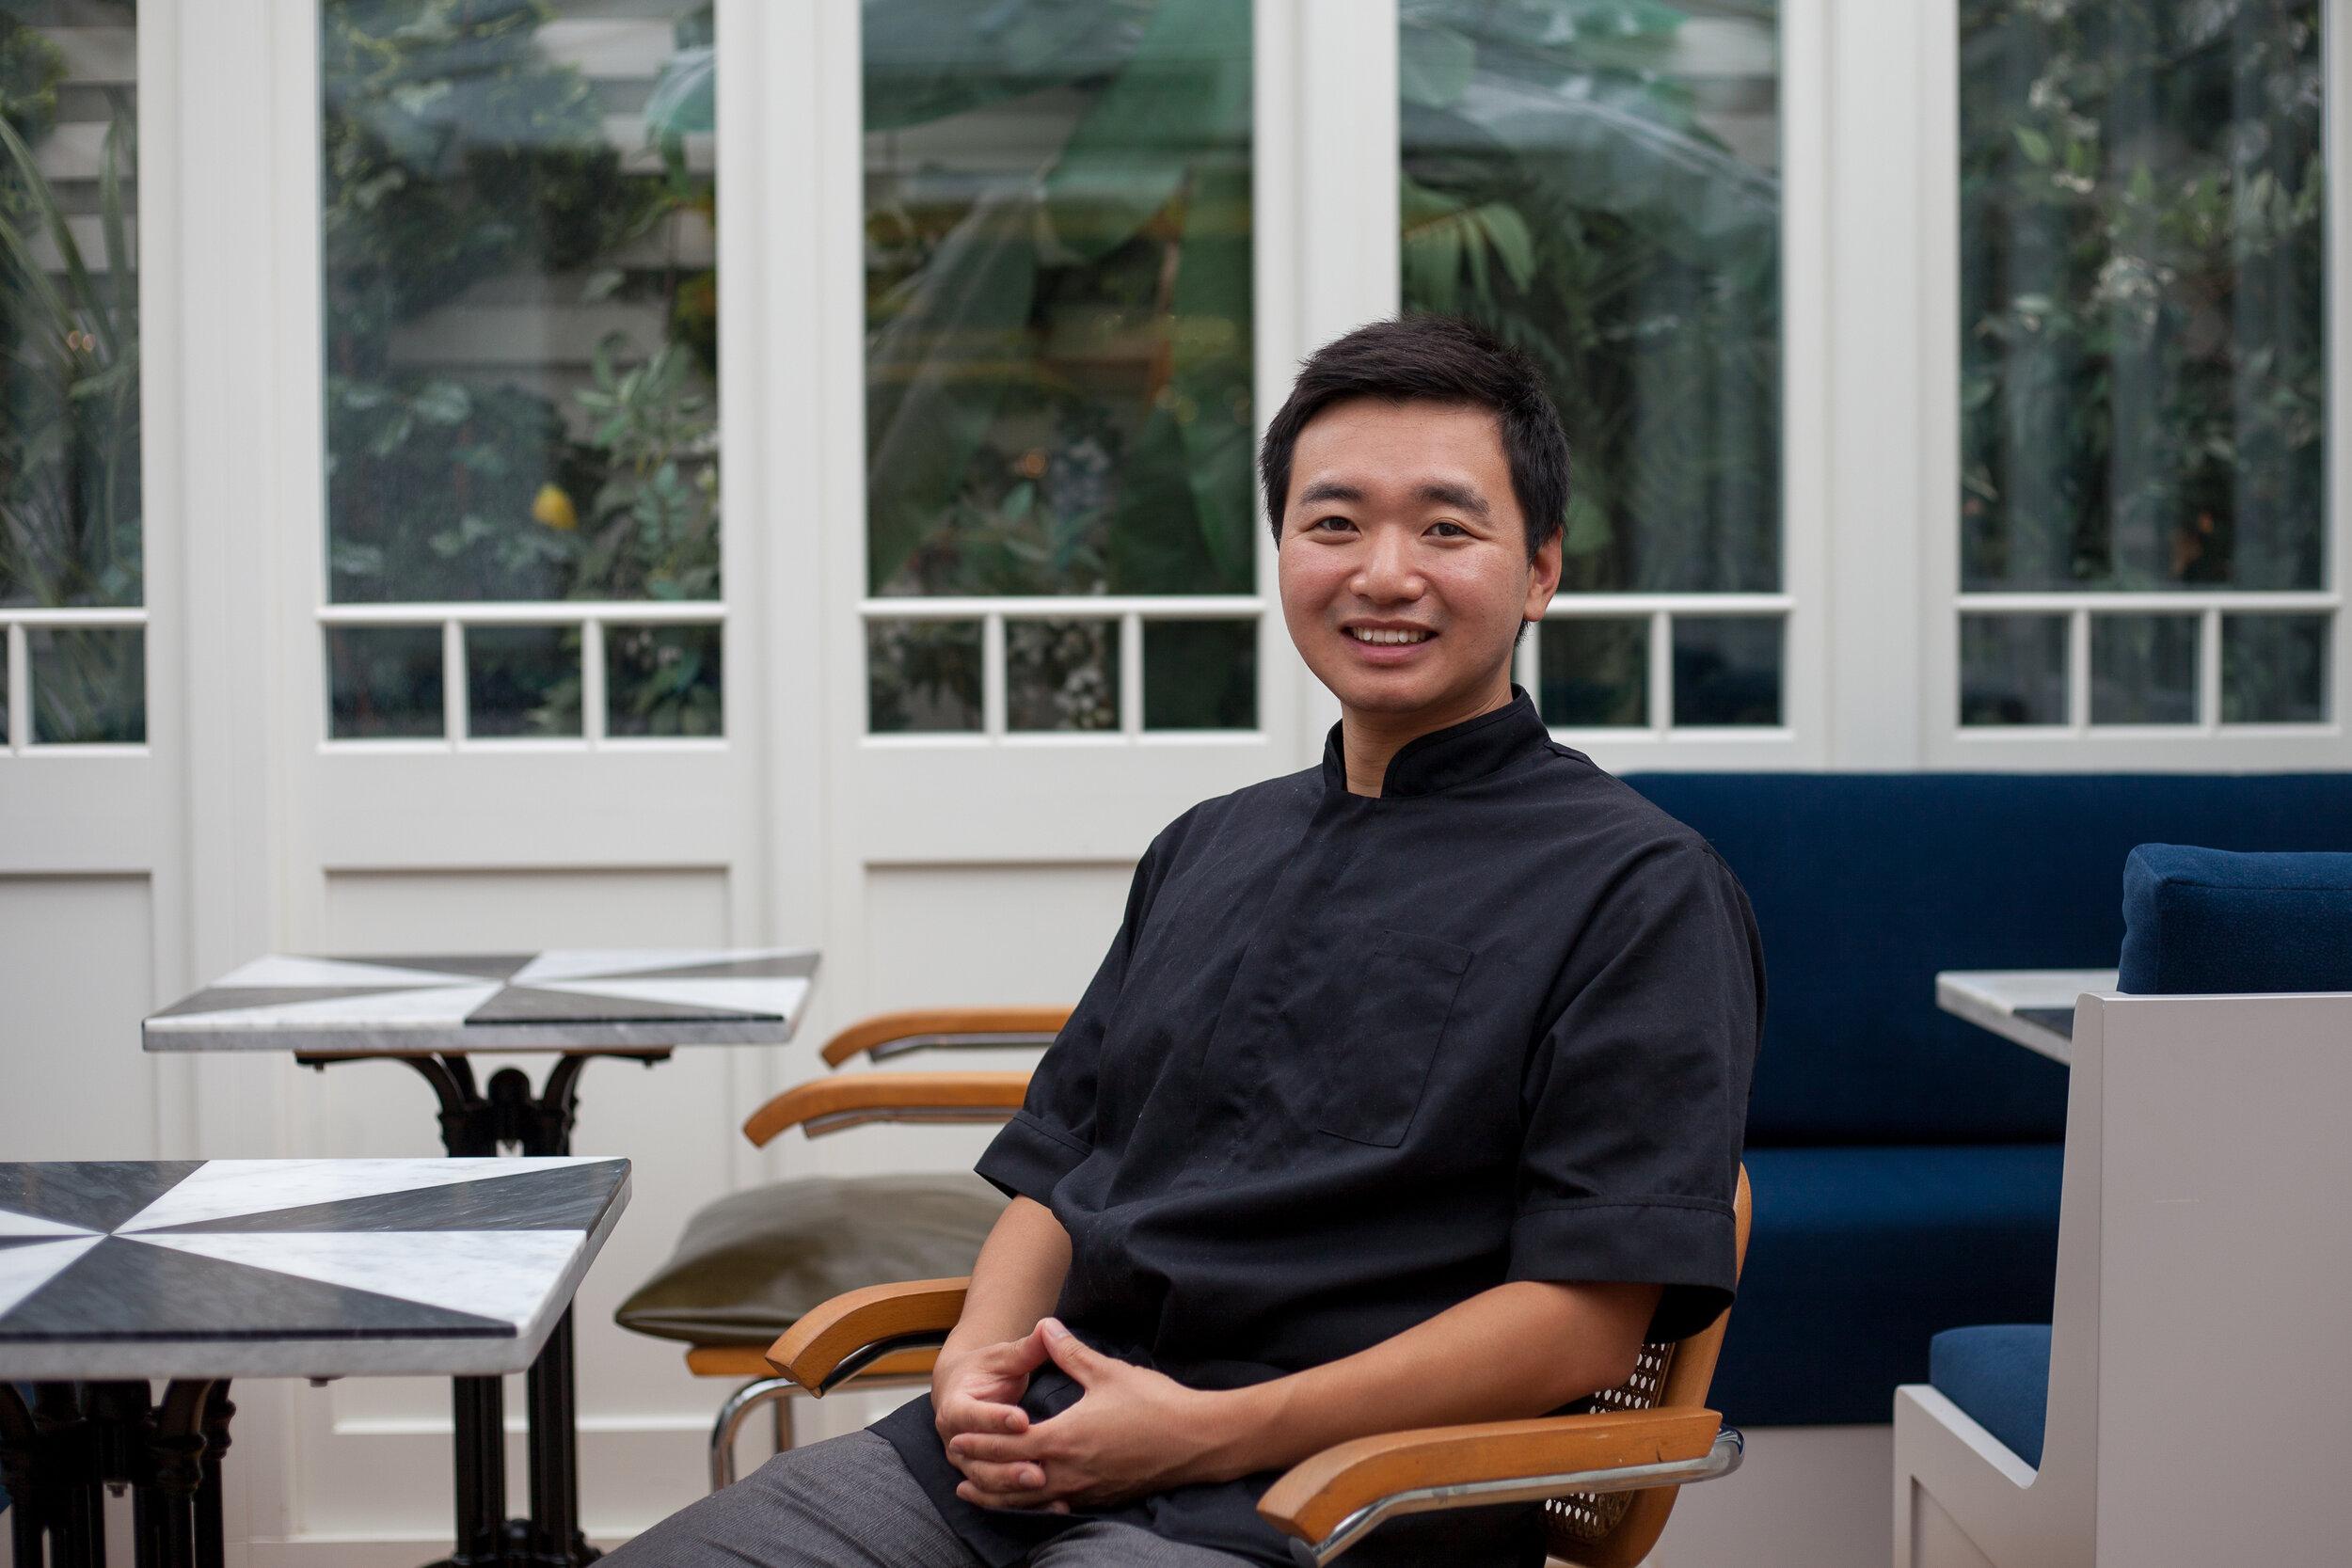 Gazelli Master of Acupuncture and Oriental Medicine Phoebus Tian